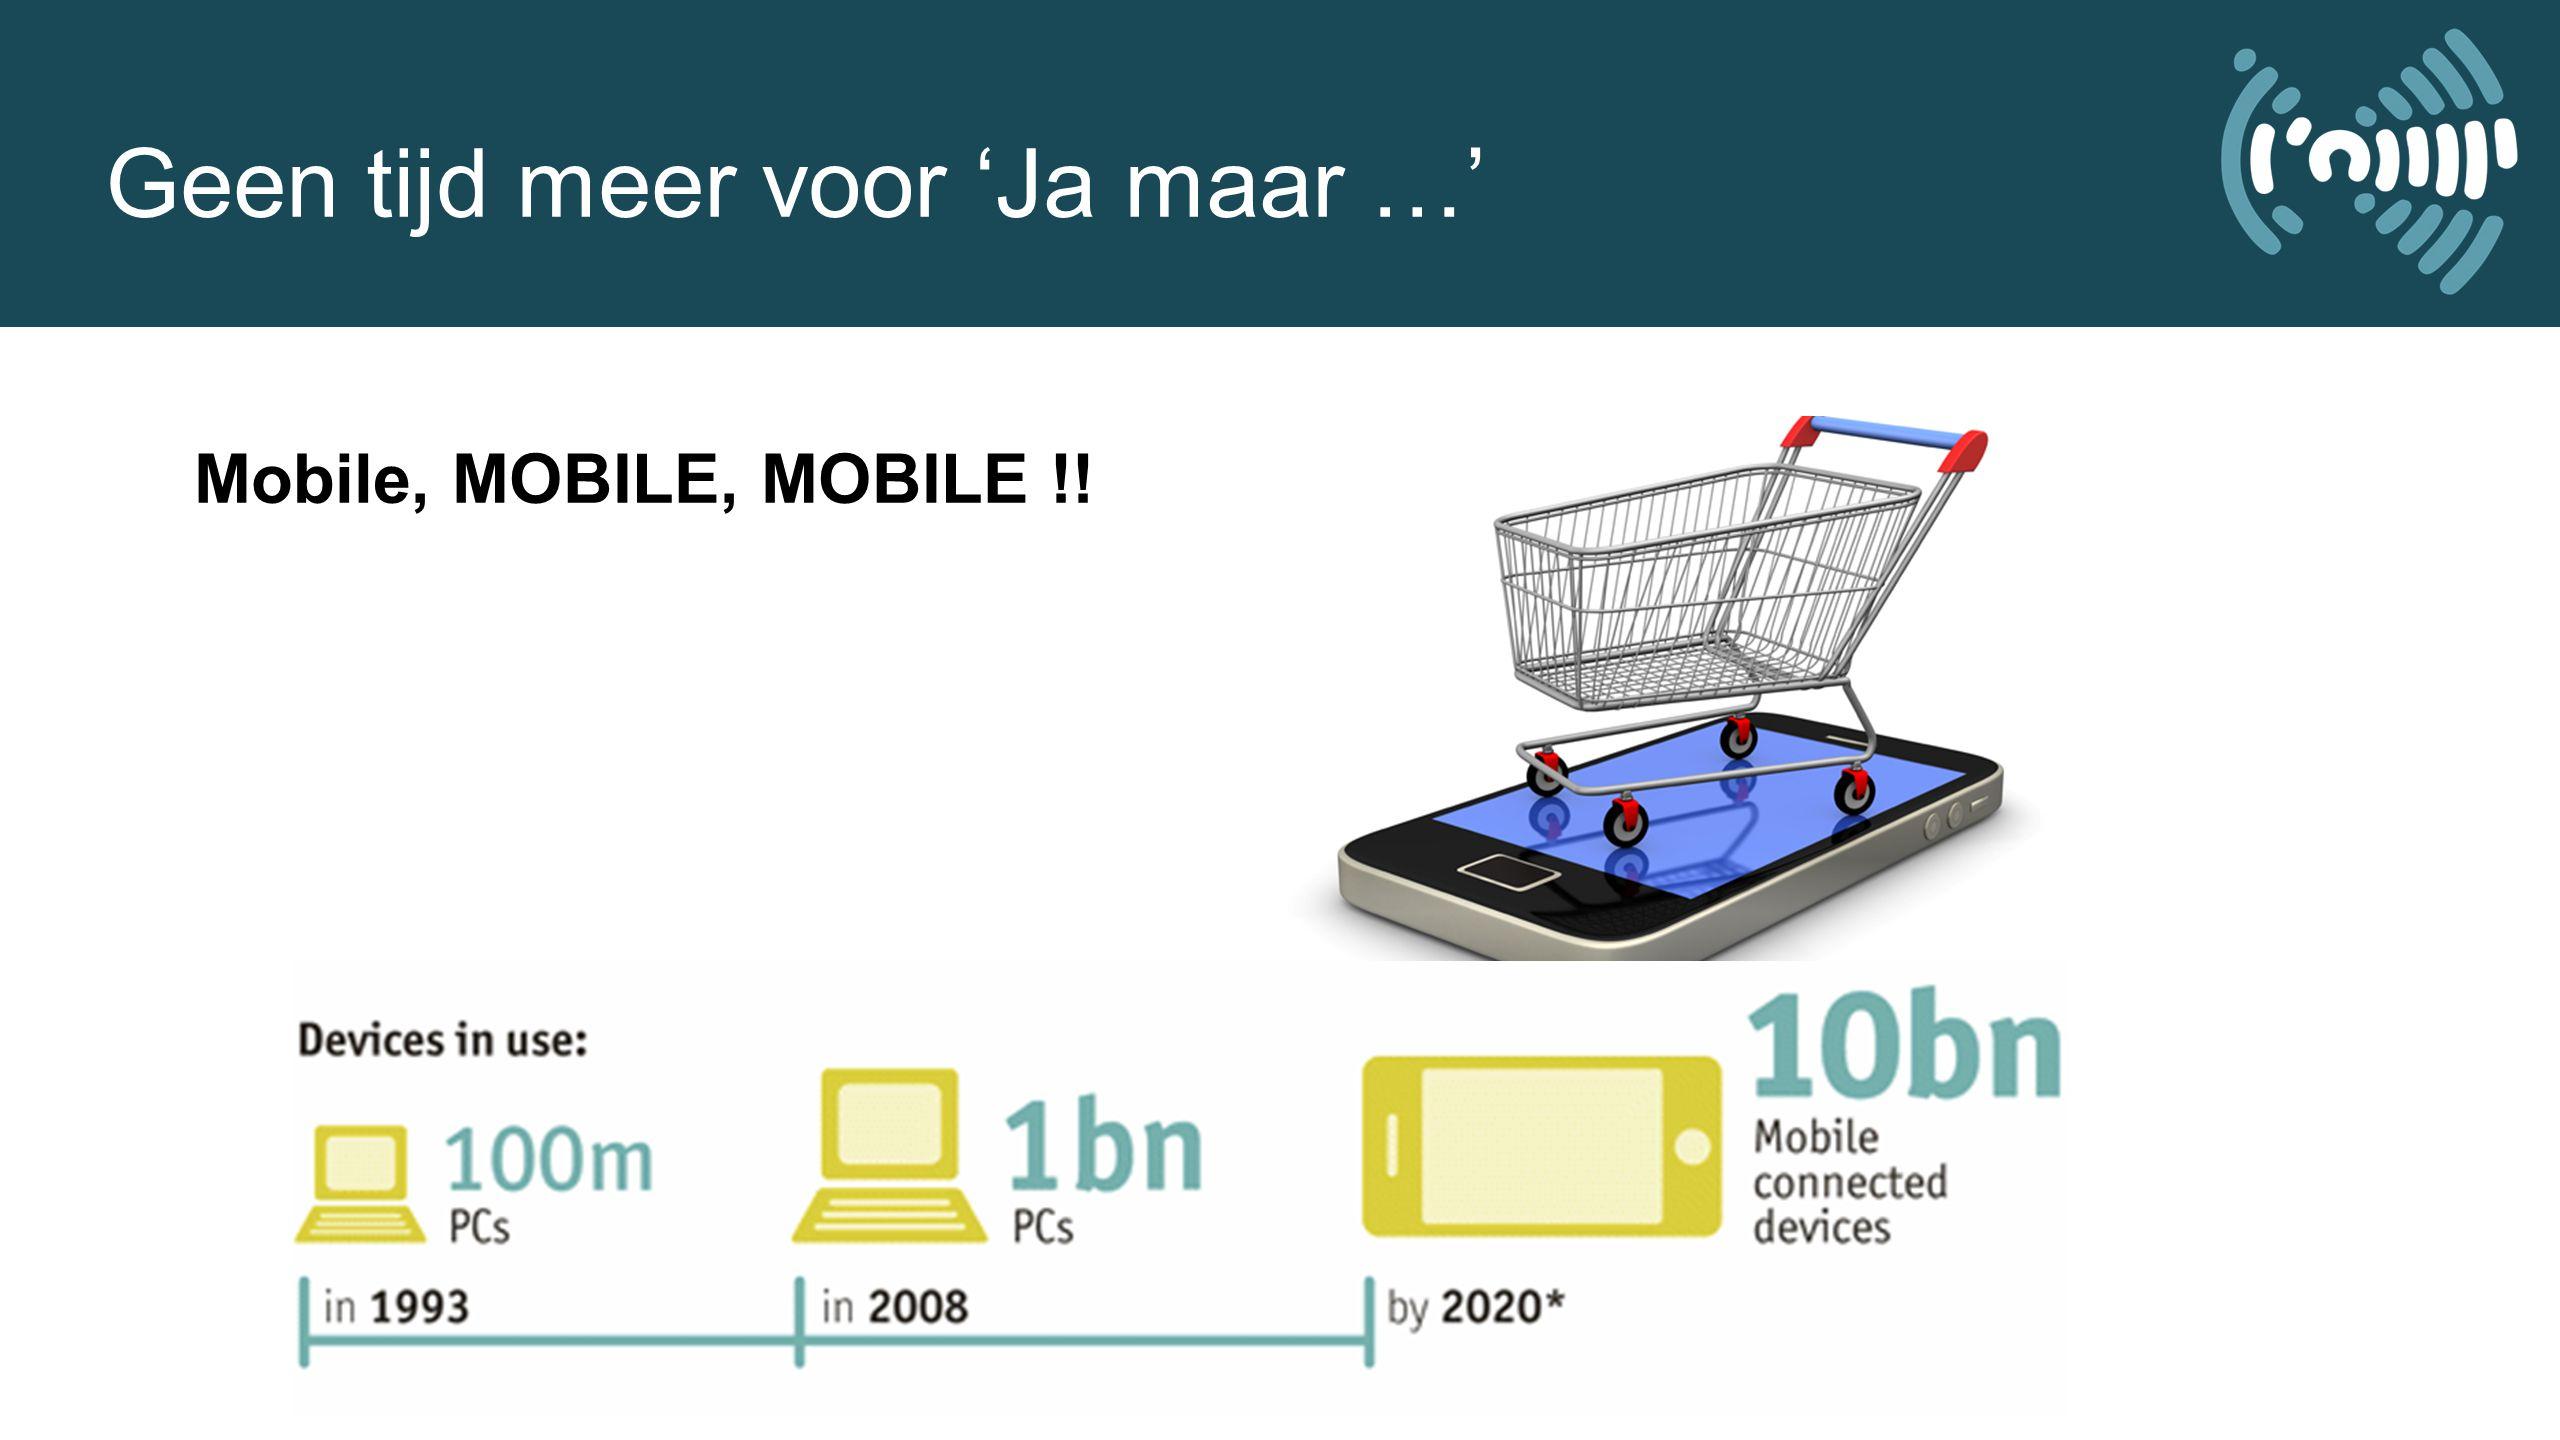 Mobile, MOBILE, MOBILE !!